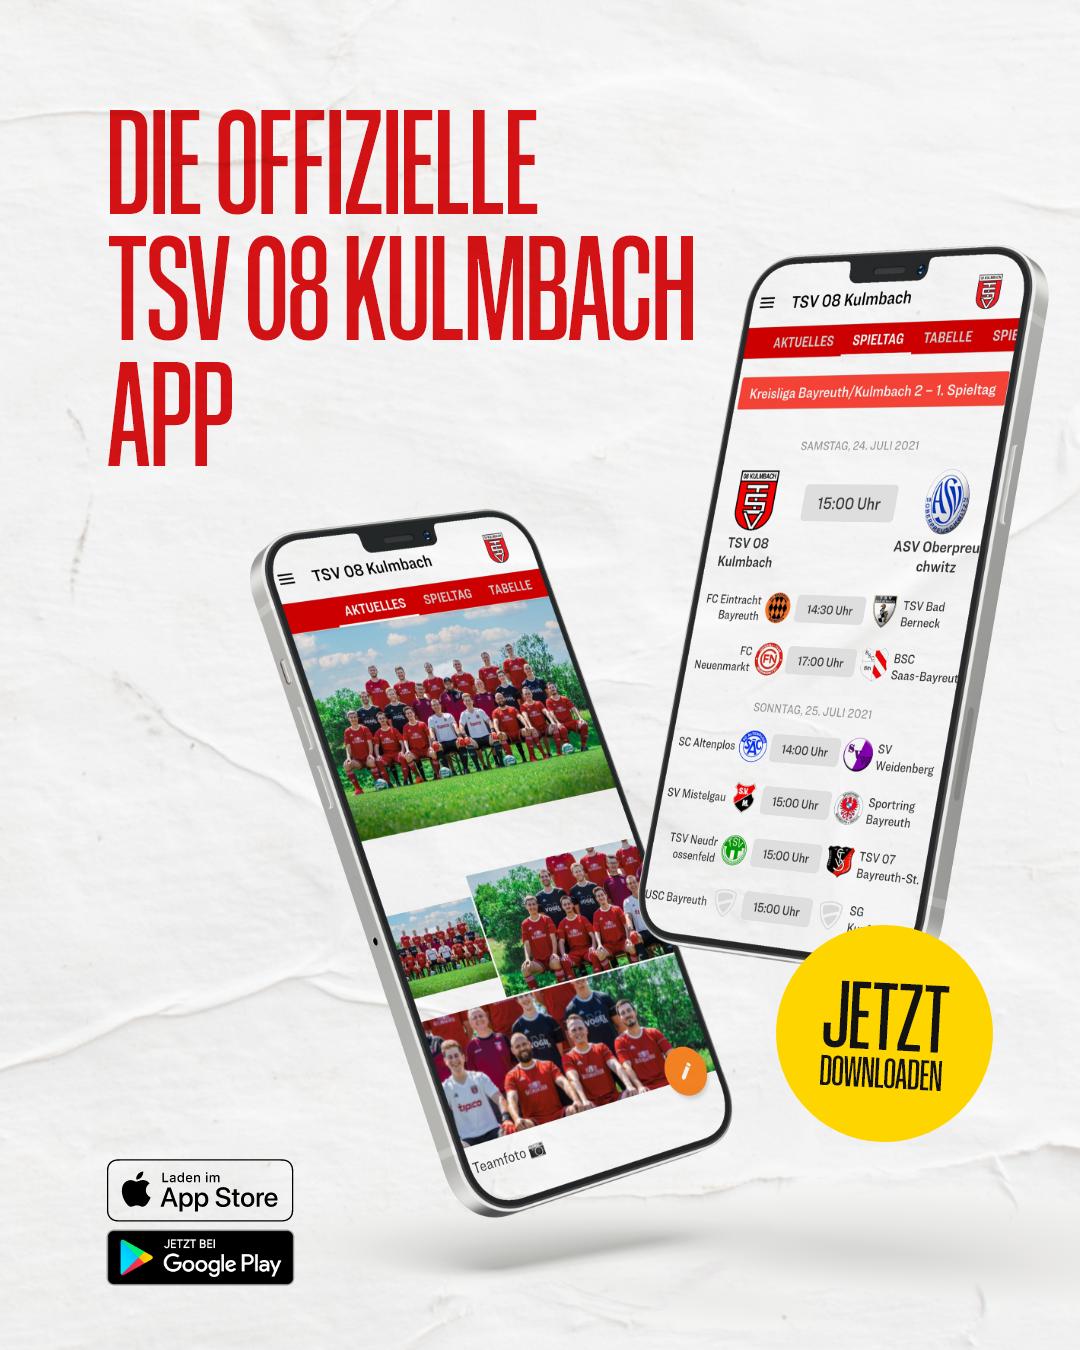 Die offizielle TSV 08 Kulmbach App